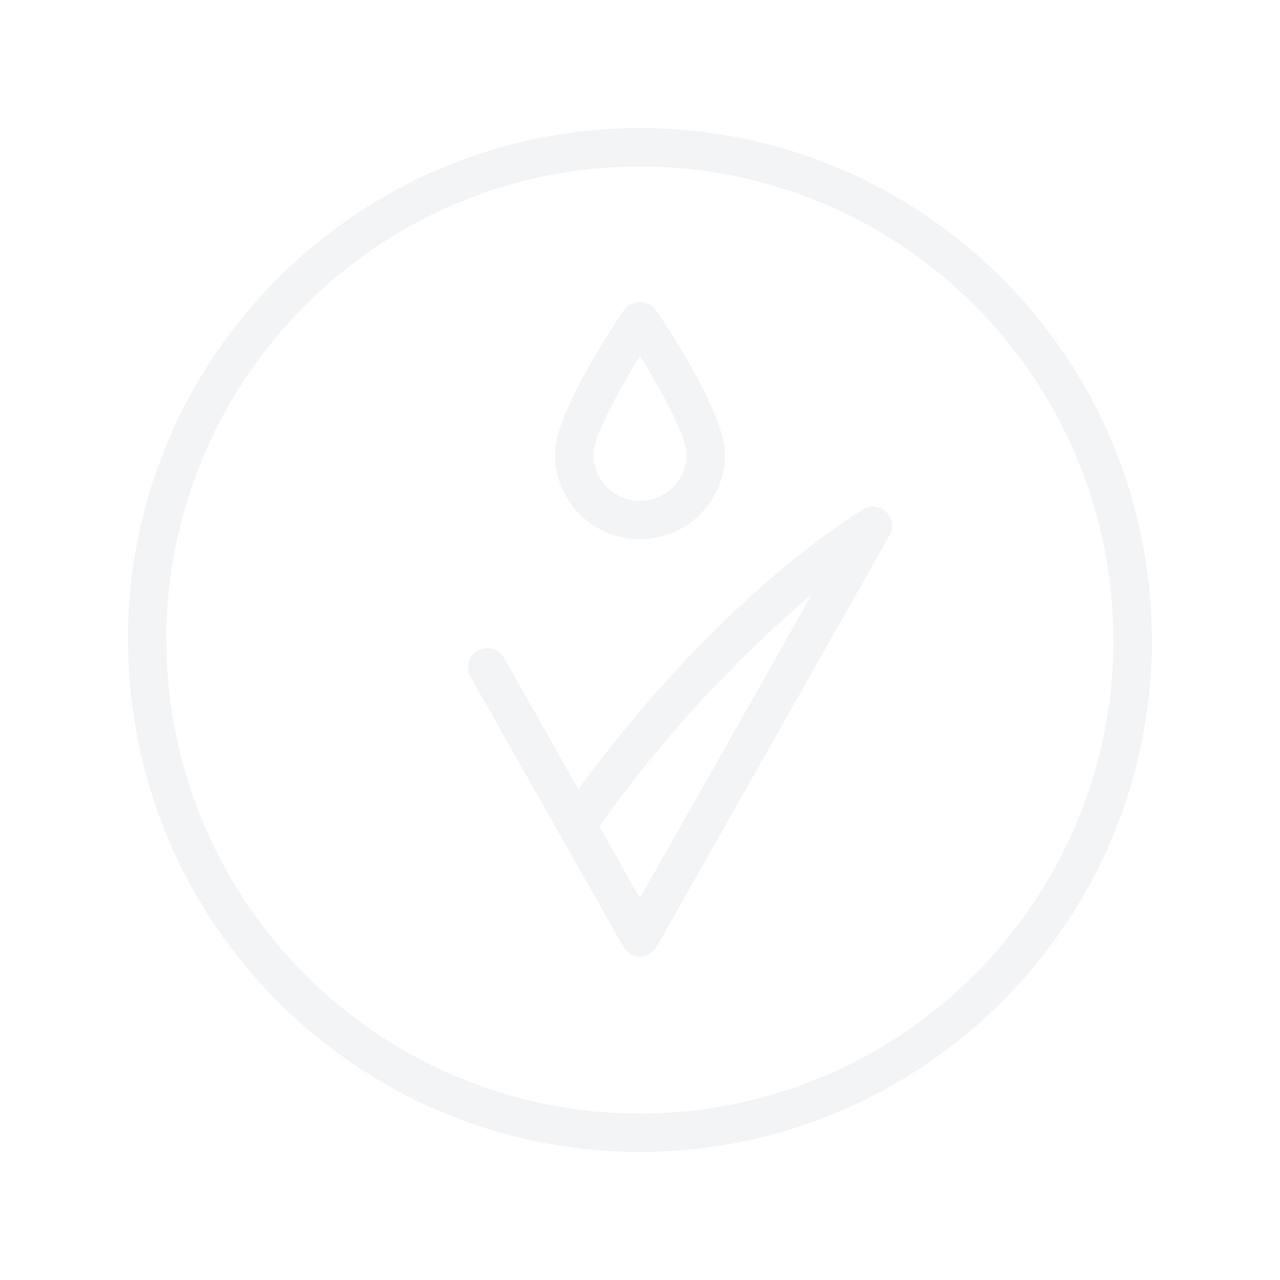 PALMER'S Cocoa Butter Magic Foot Scrub 60g